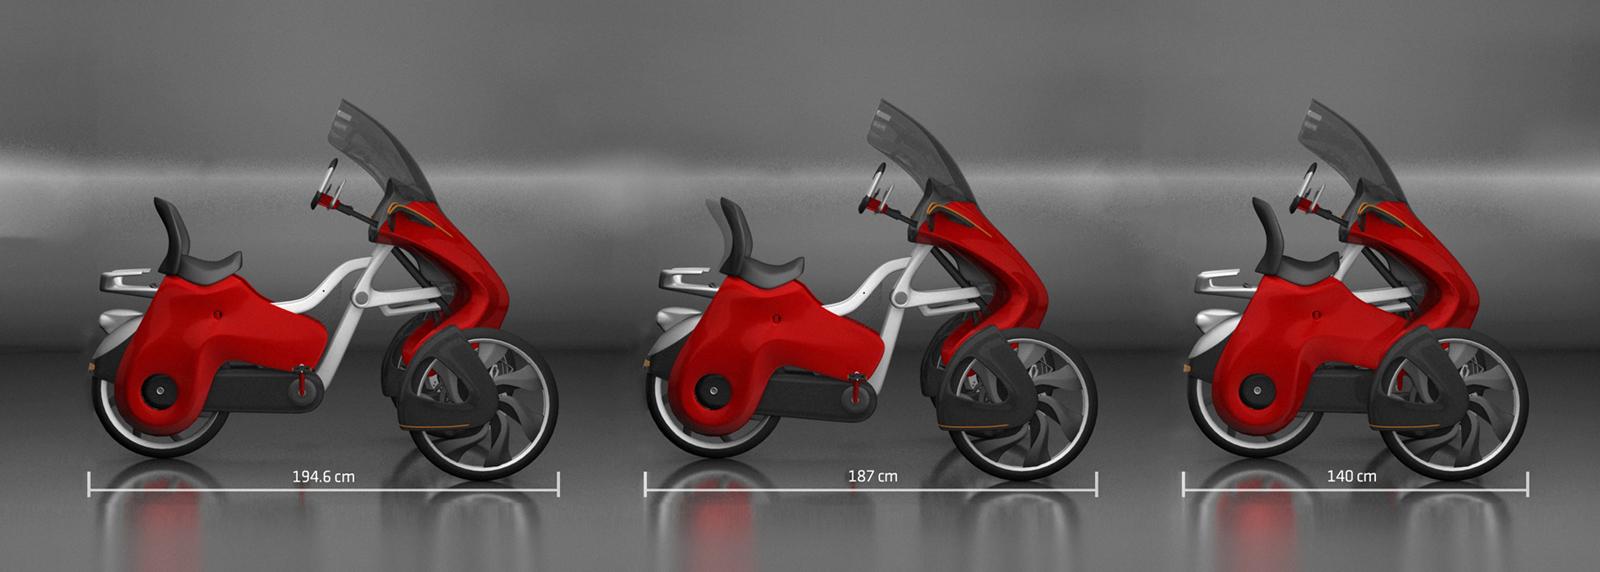 schéma explicative velomobile BTWIN